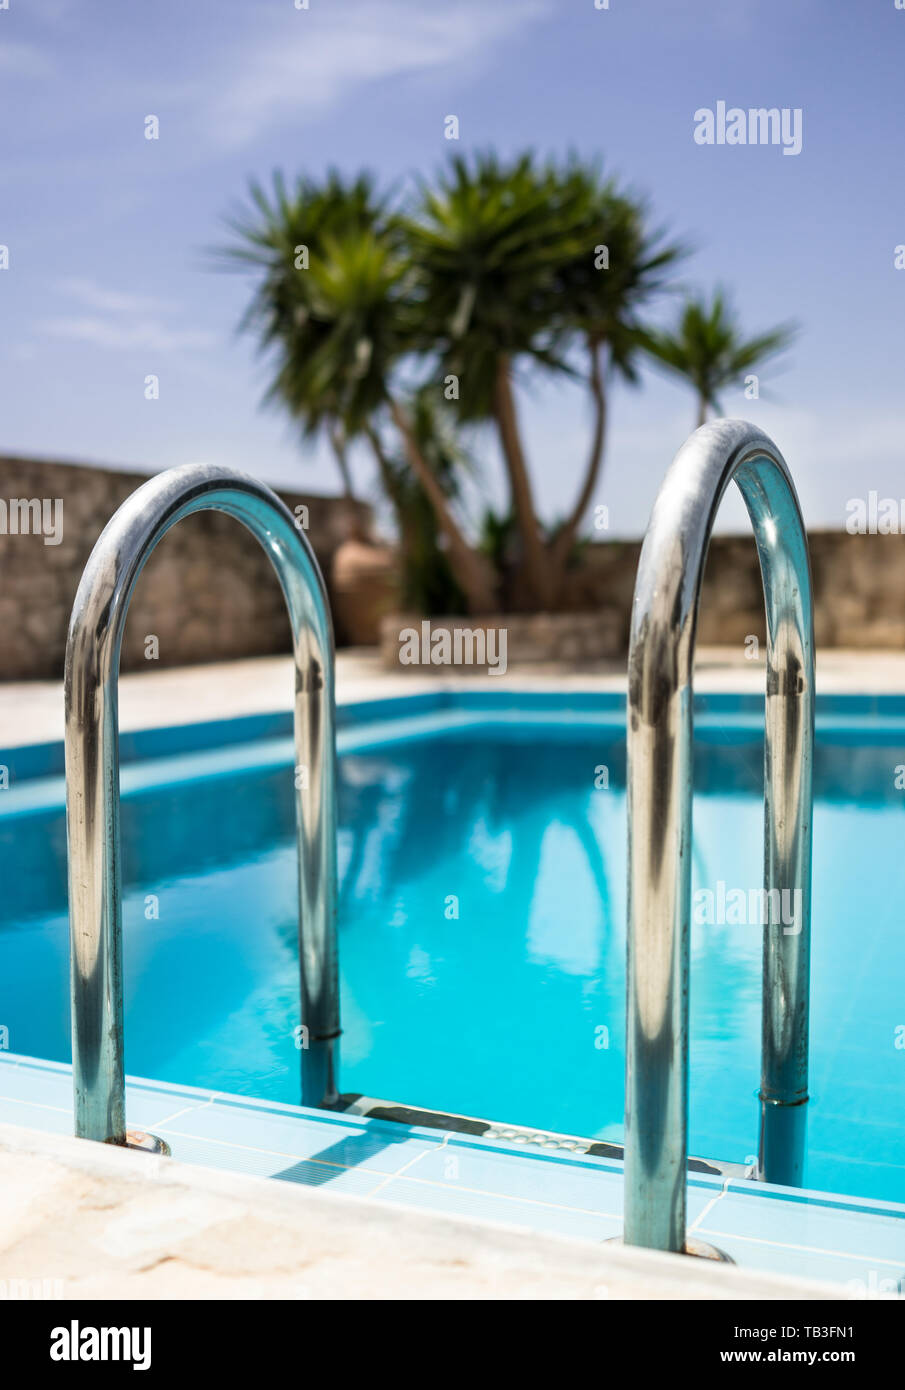 Piscine En Inox Steel And Style stainless steel pool stock photos & stainless steel pool